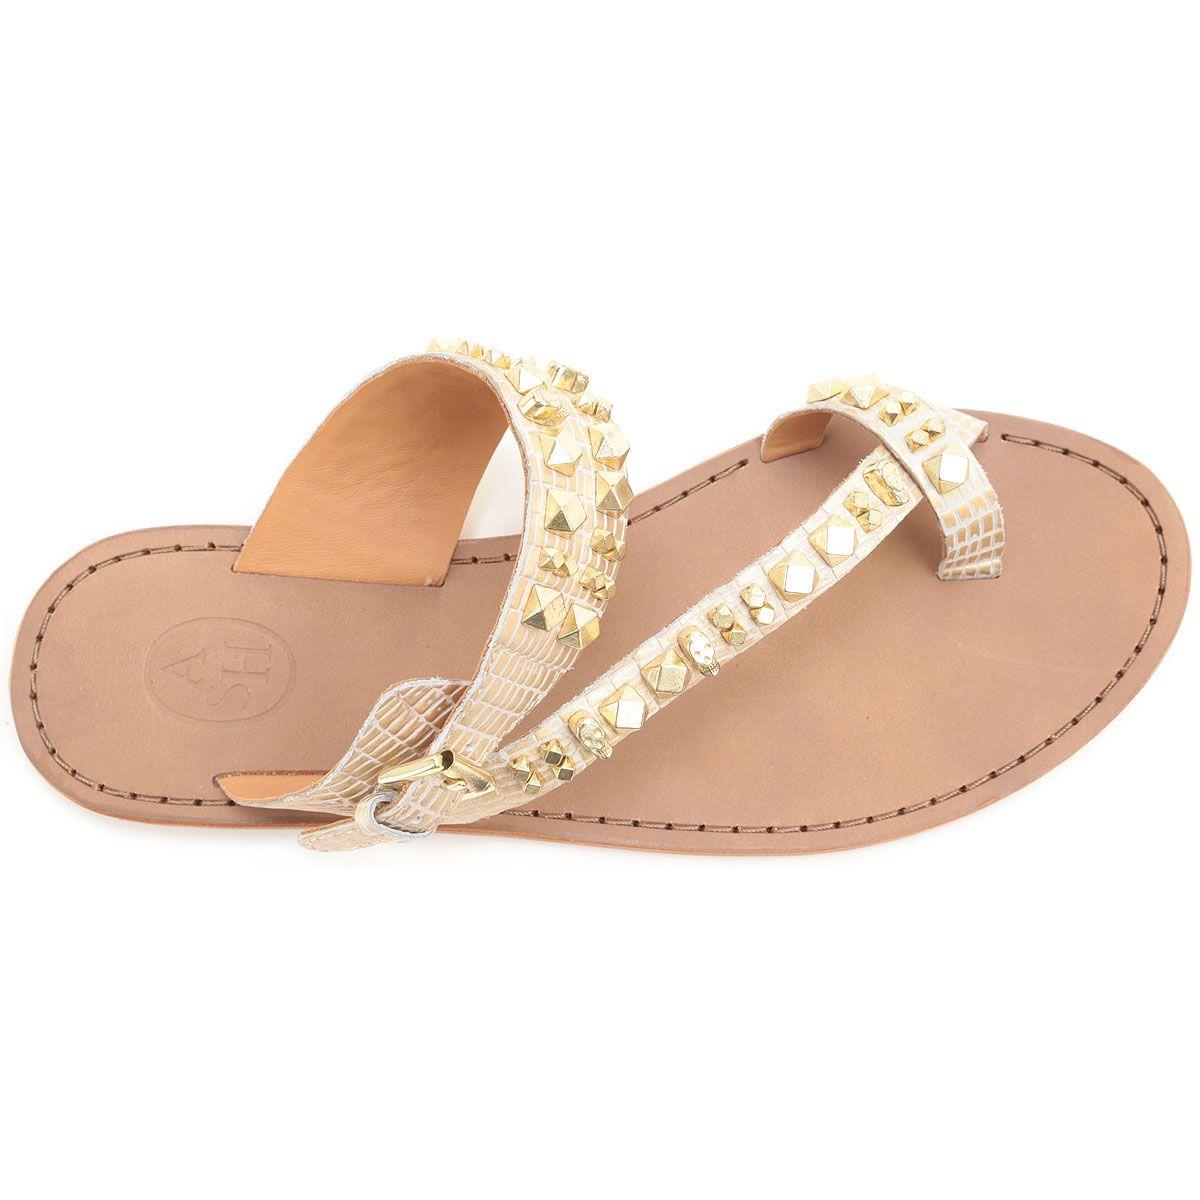 Zapatos para Mujer Ash, Detalle Modelo: neroli--